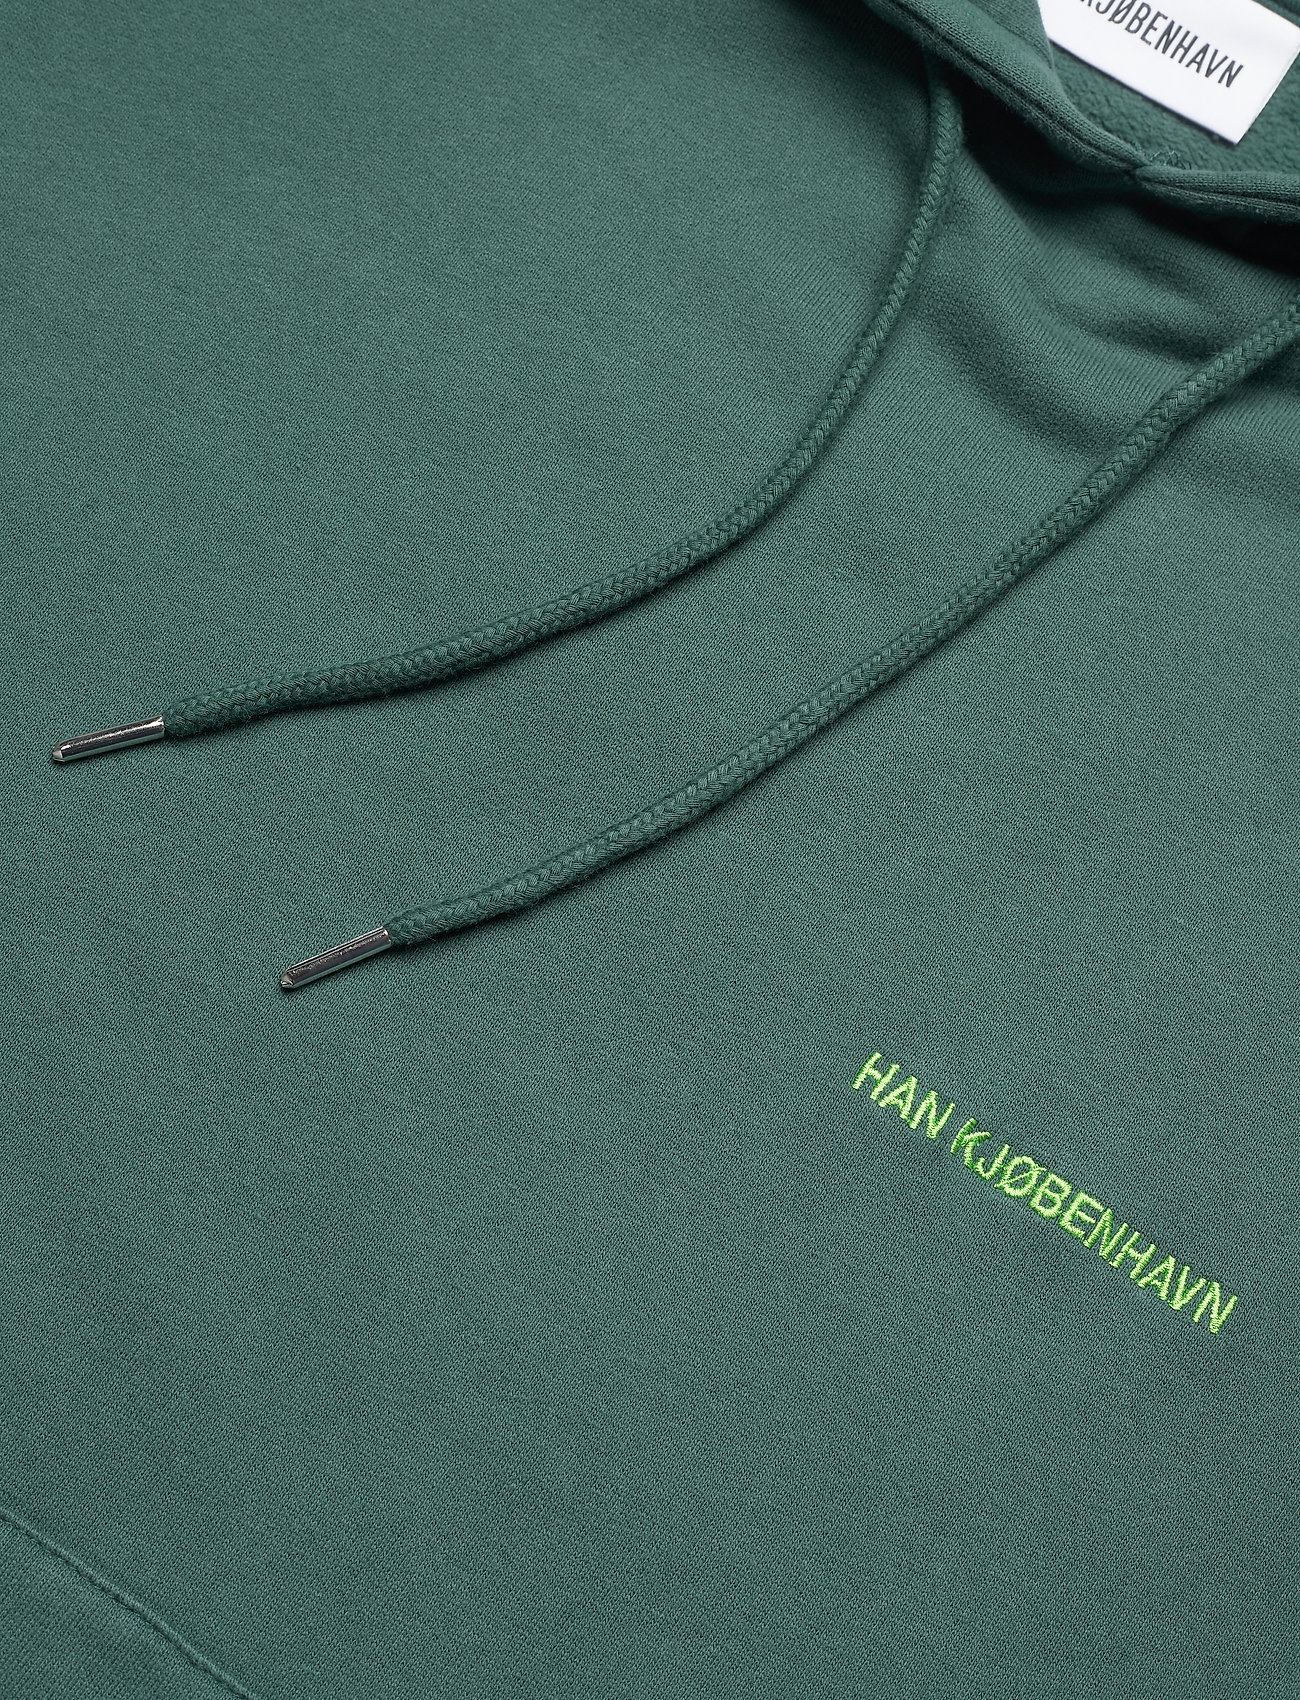 HAN Kjøbenhavn Bulky Hoodie - Sweatshirts FADED GREEN - Menn Klær